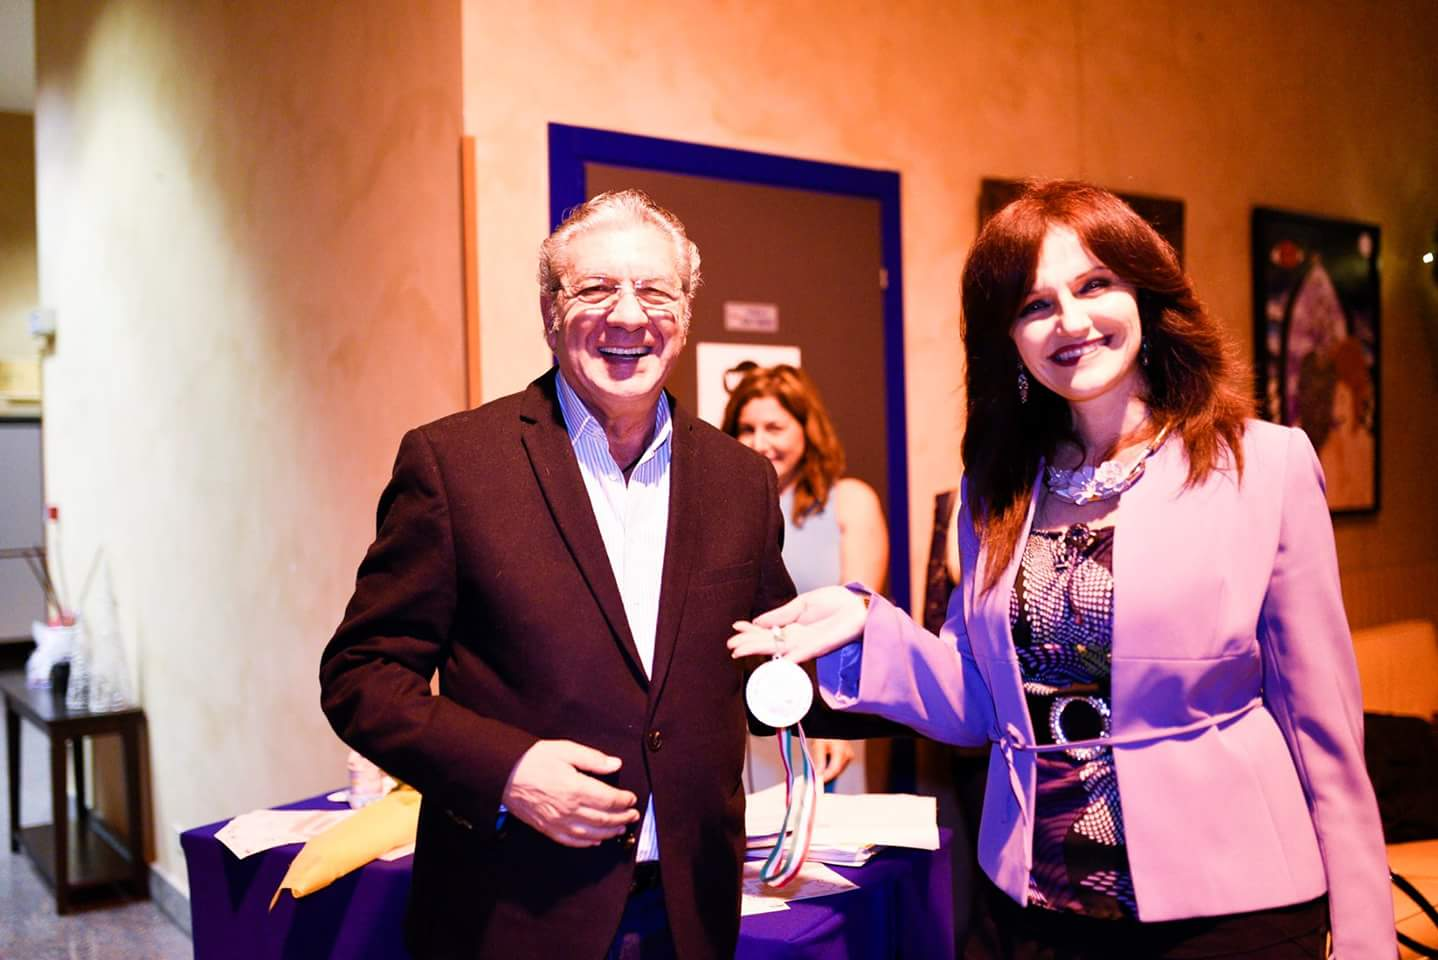 Franco Micalizzi consegna la medaglia di Storie di Donne 2016 a Roberta Gulotta